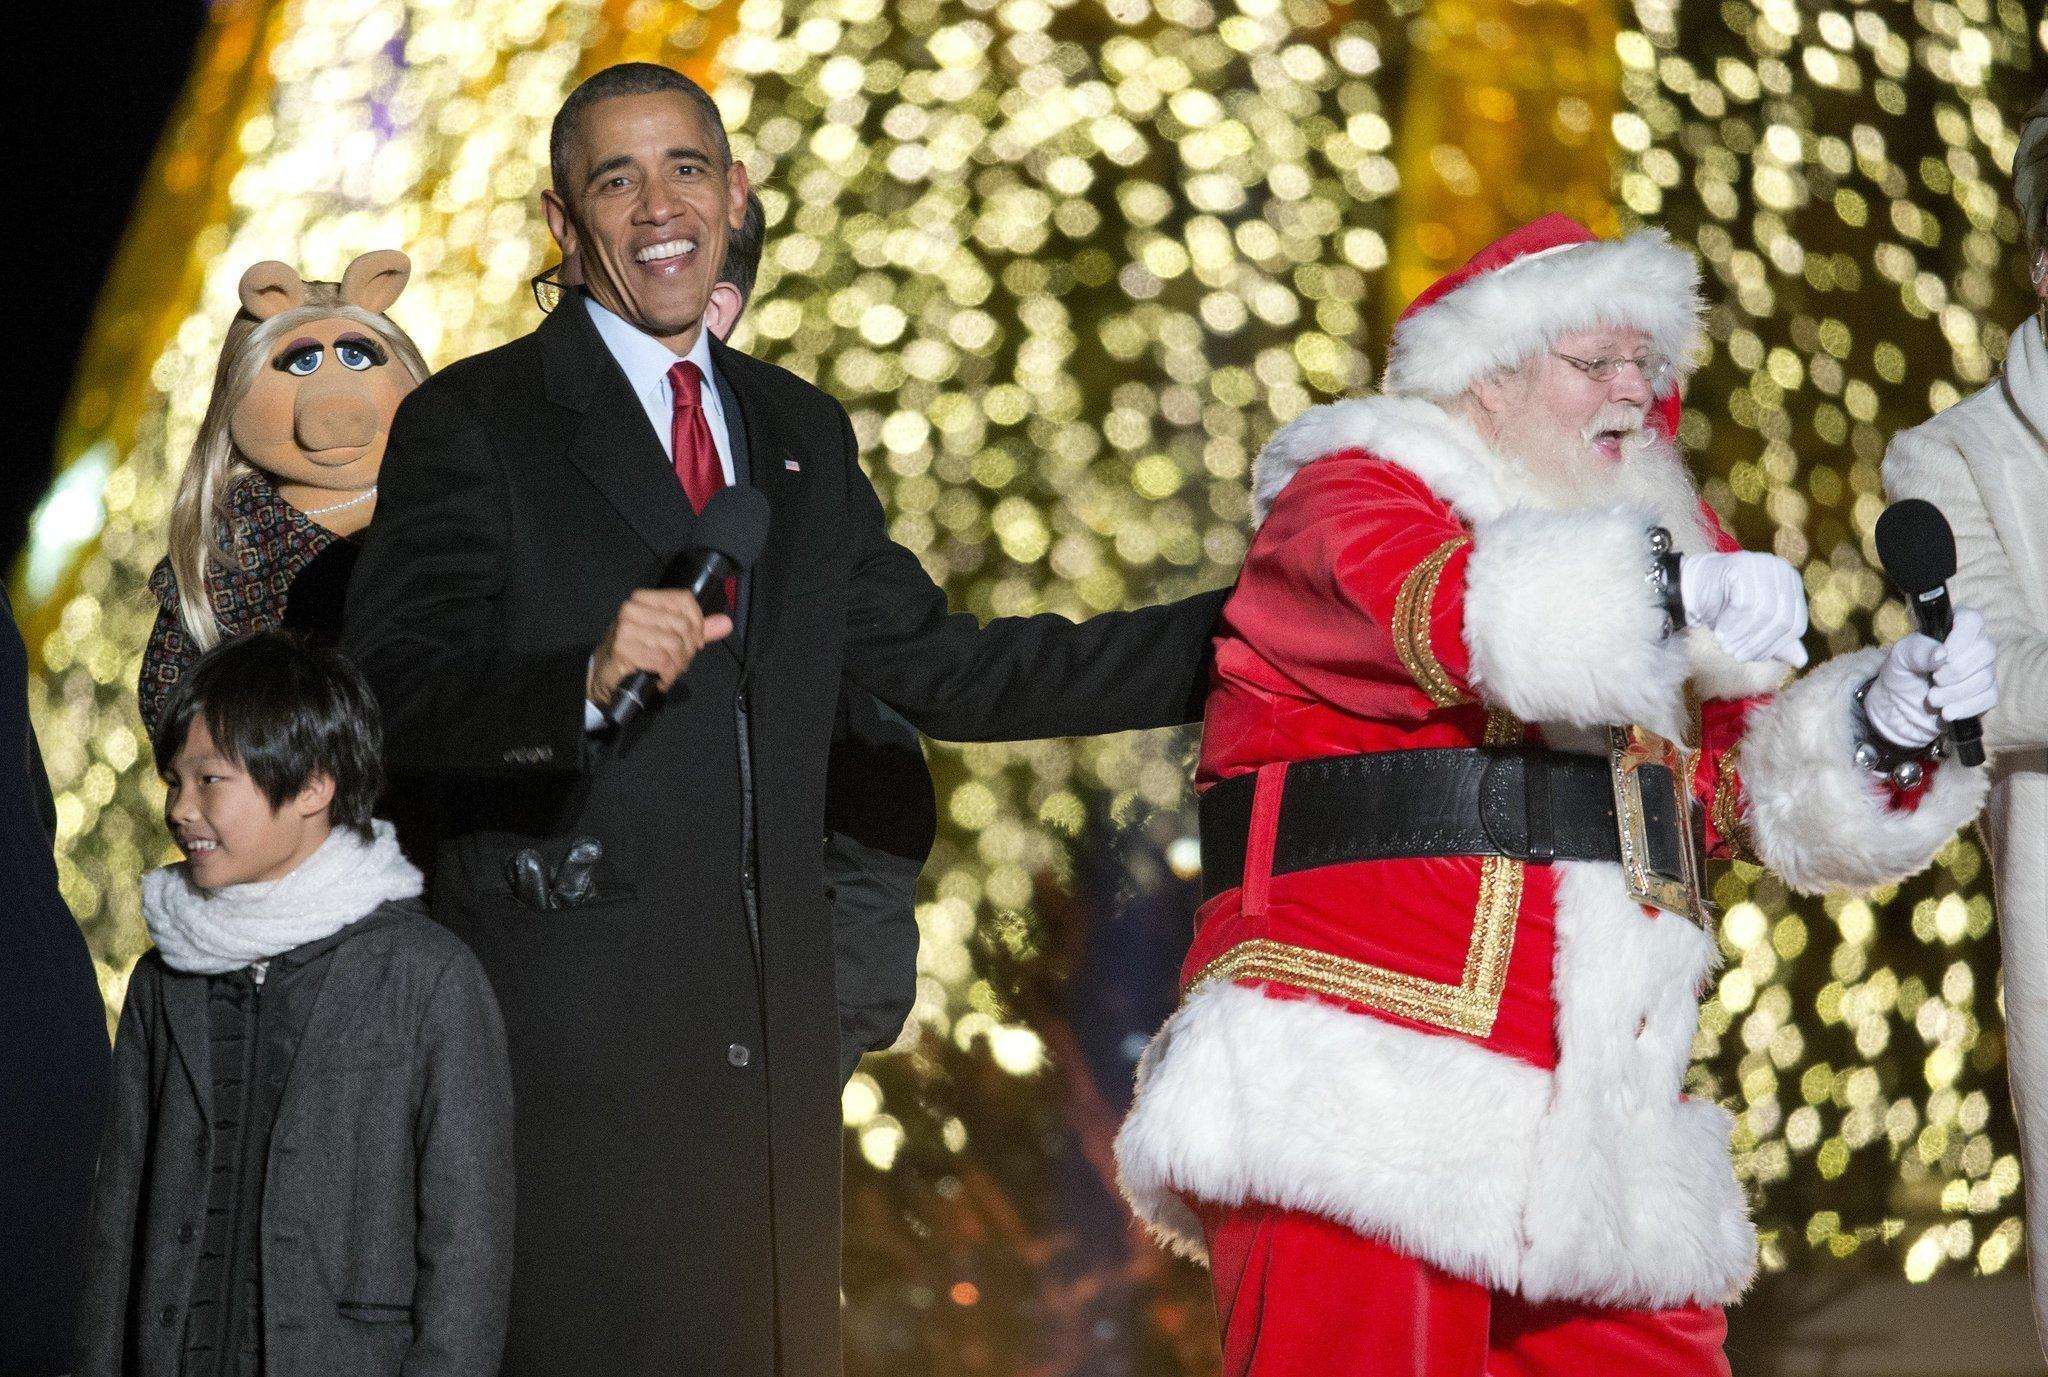 Obama lights Christmas tree, appeals for brotherhood - The San Diego ...